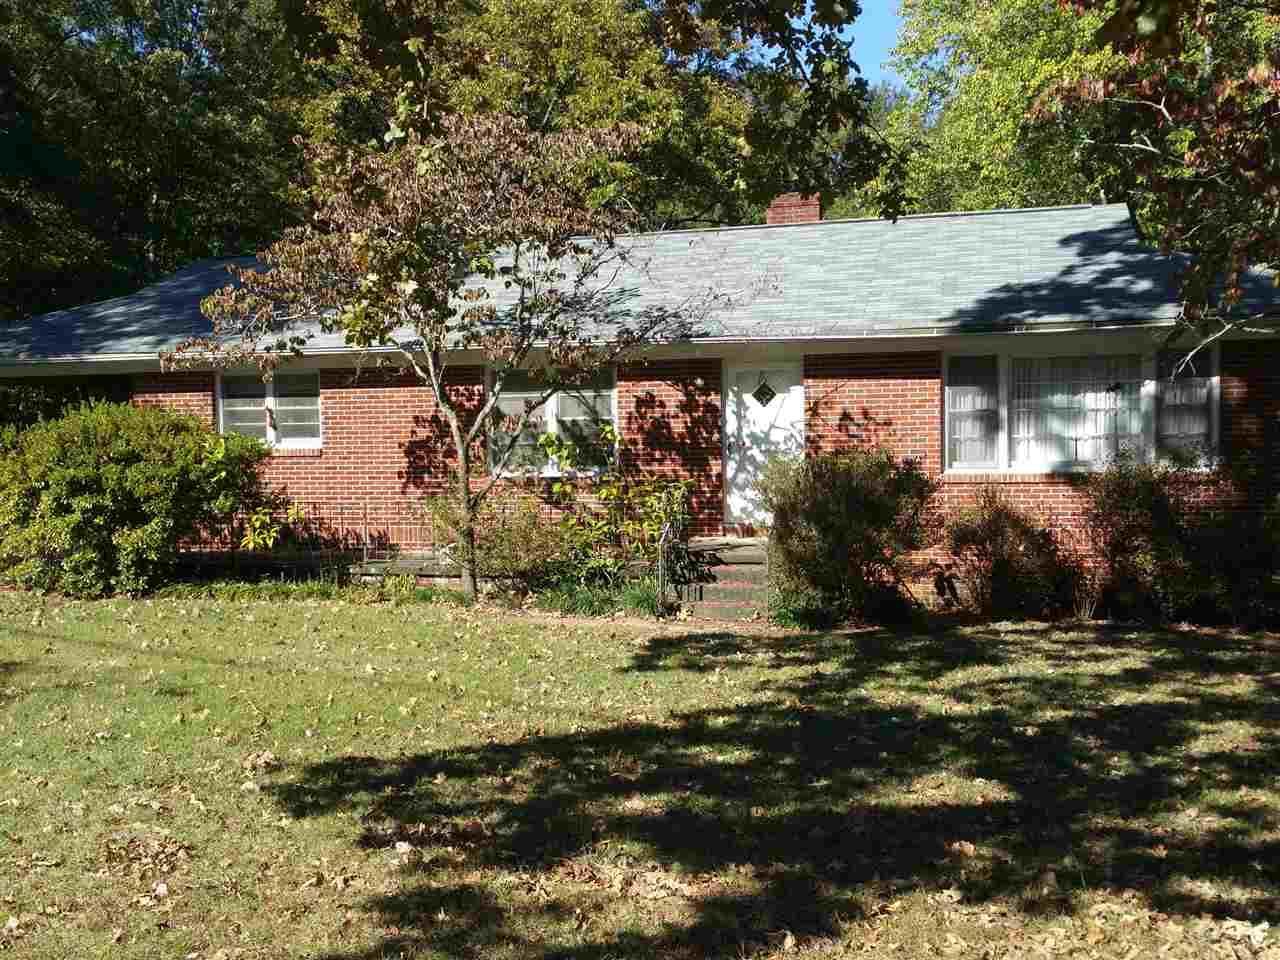 303 Skyview Drive, Clemson, SC 29631 (MLS #20181679) :: Les Walden Real Estate